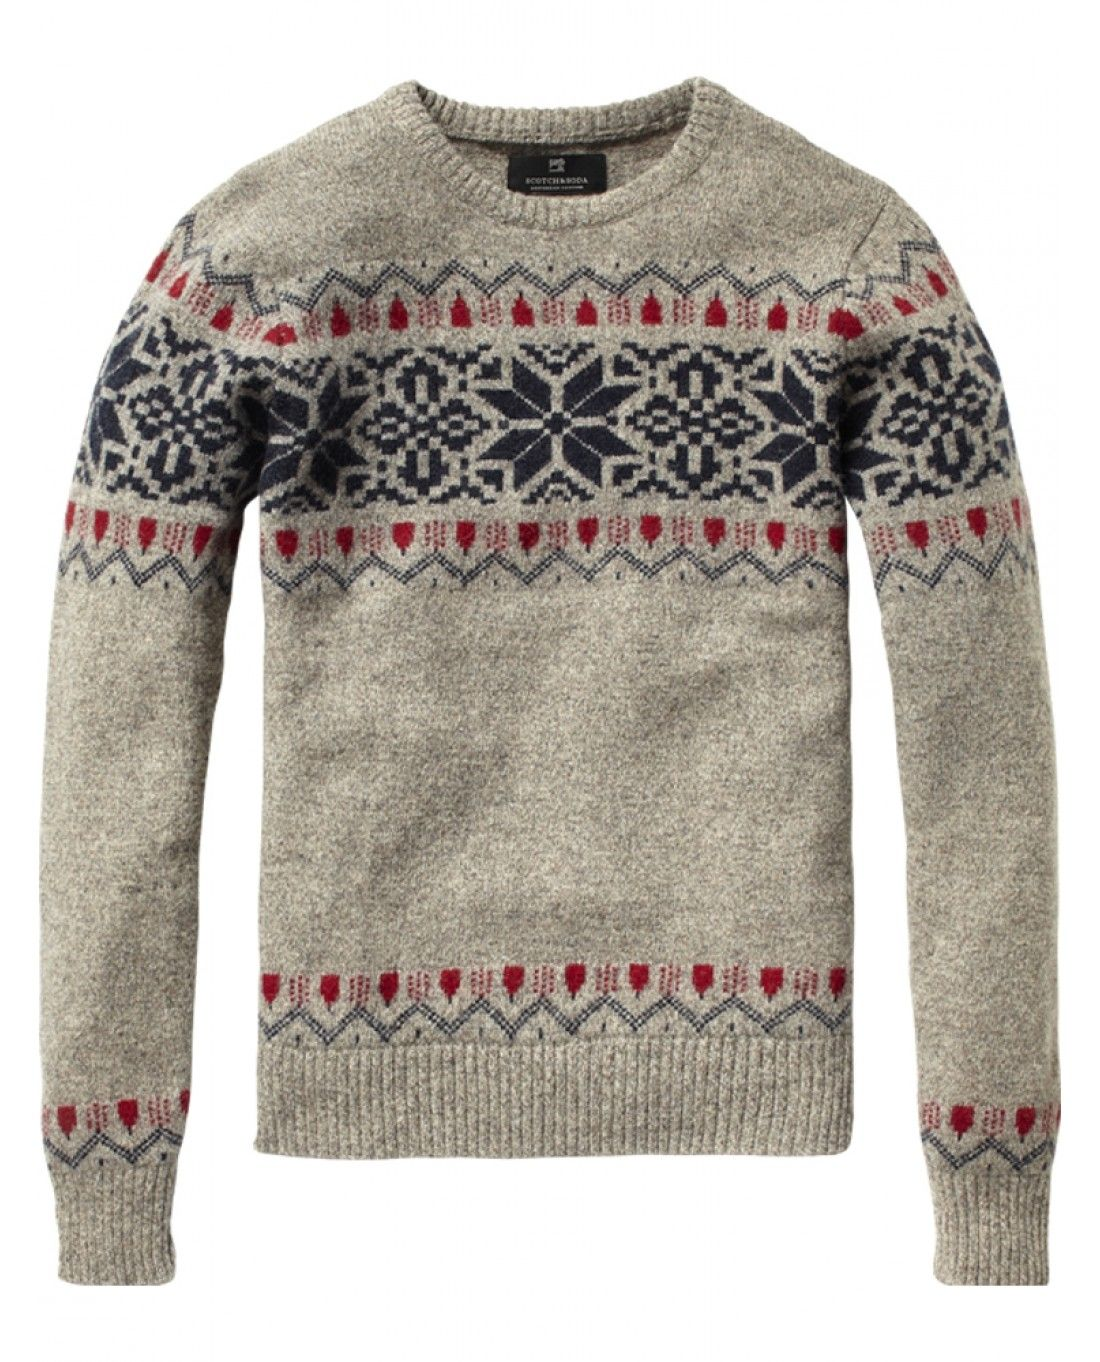 82cc5f63a4 Love sweater weather in MI. Christmas is calling  -) Fair isle crew neck  pull- Scotch   Soda.